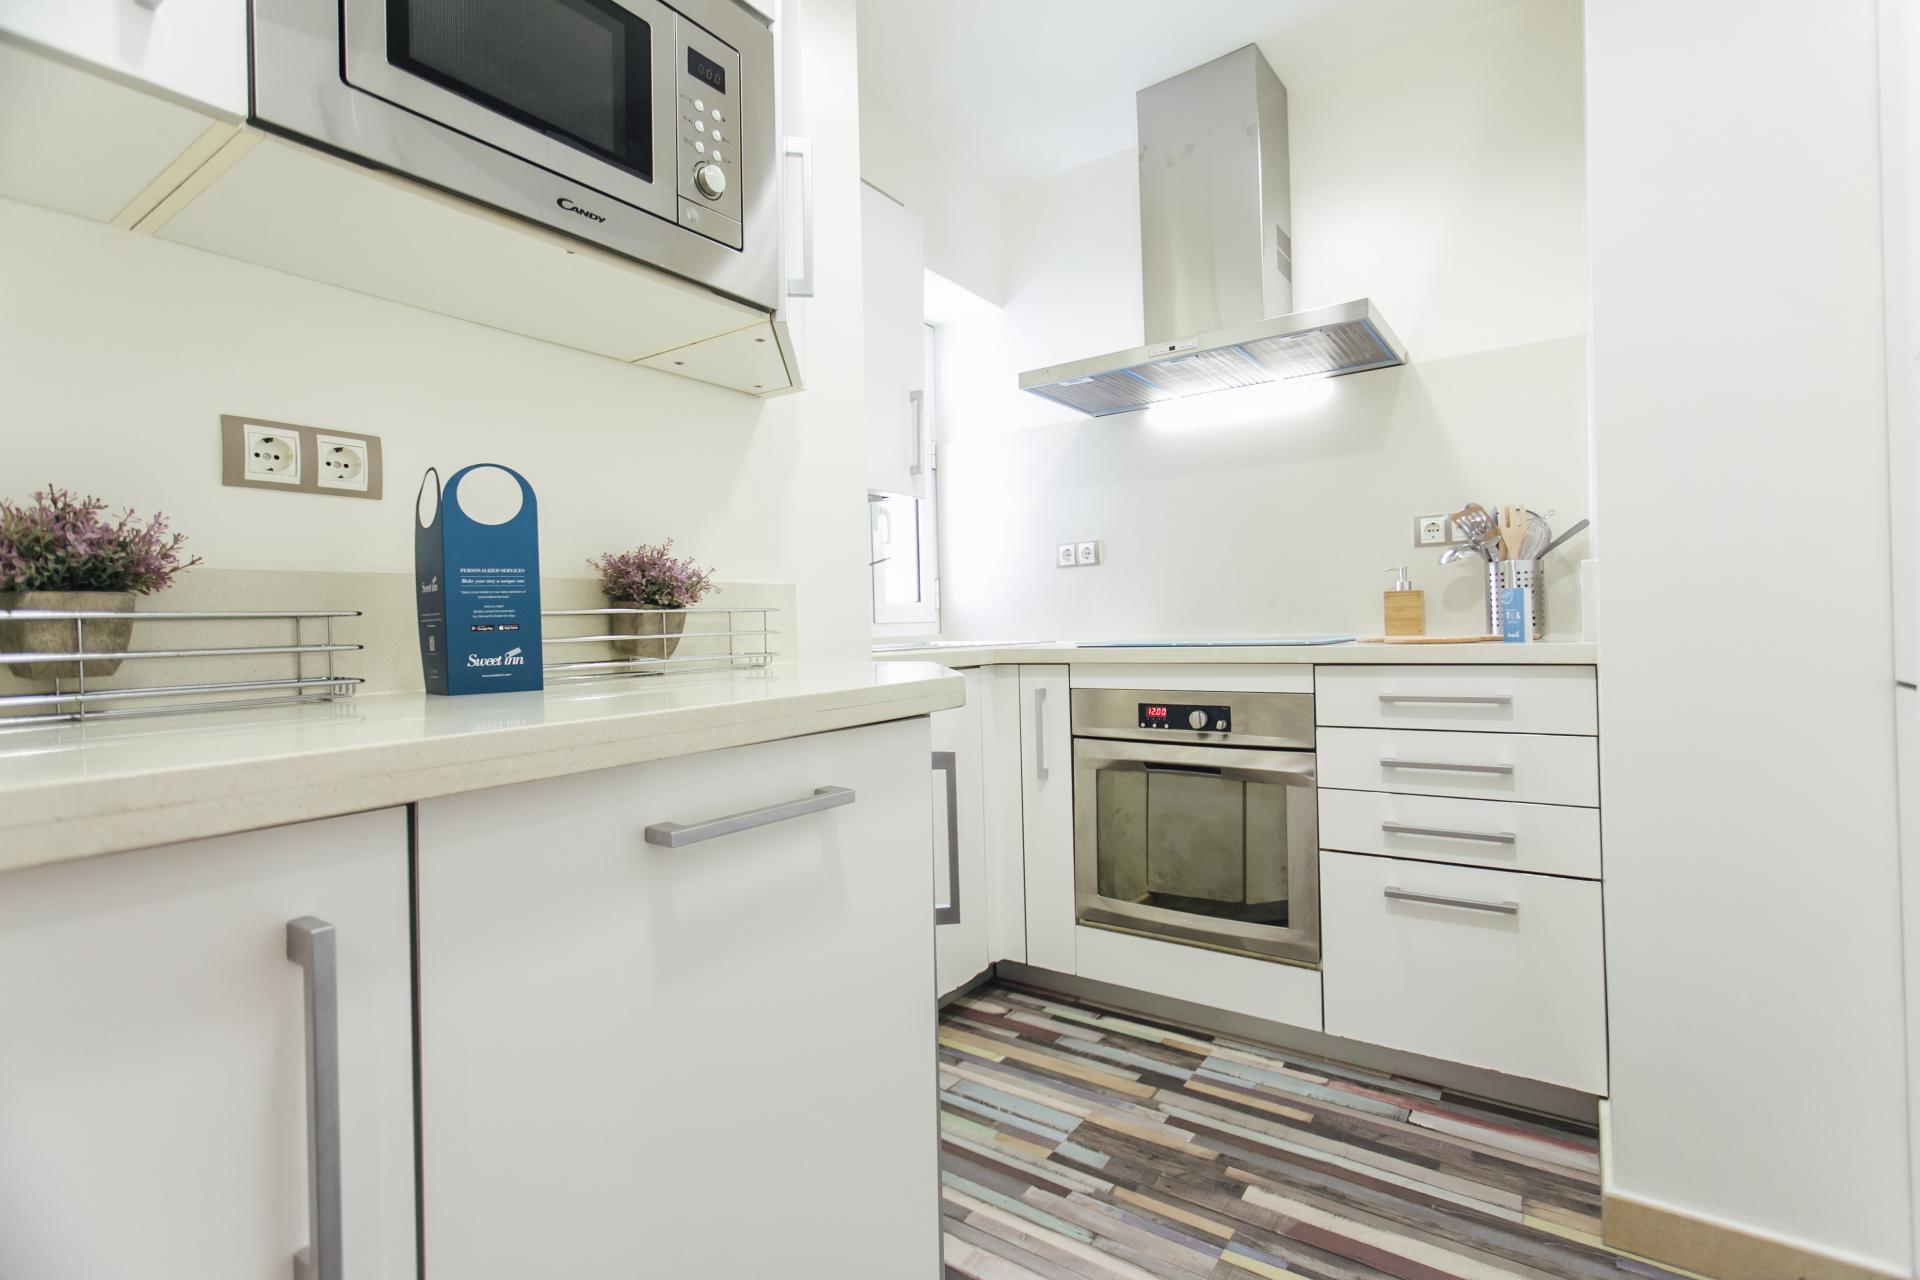 Kitchen at Arjona Apartment, Centre, Seville